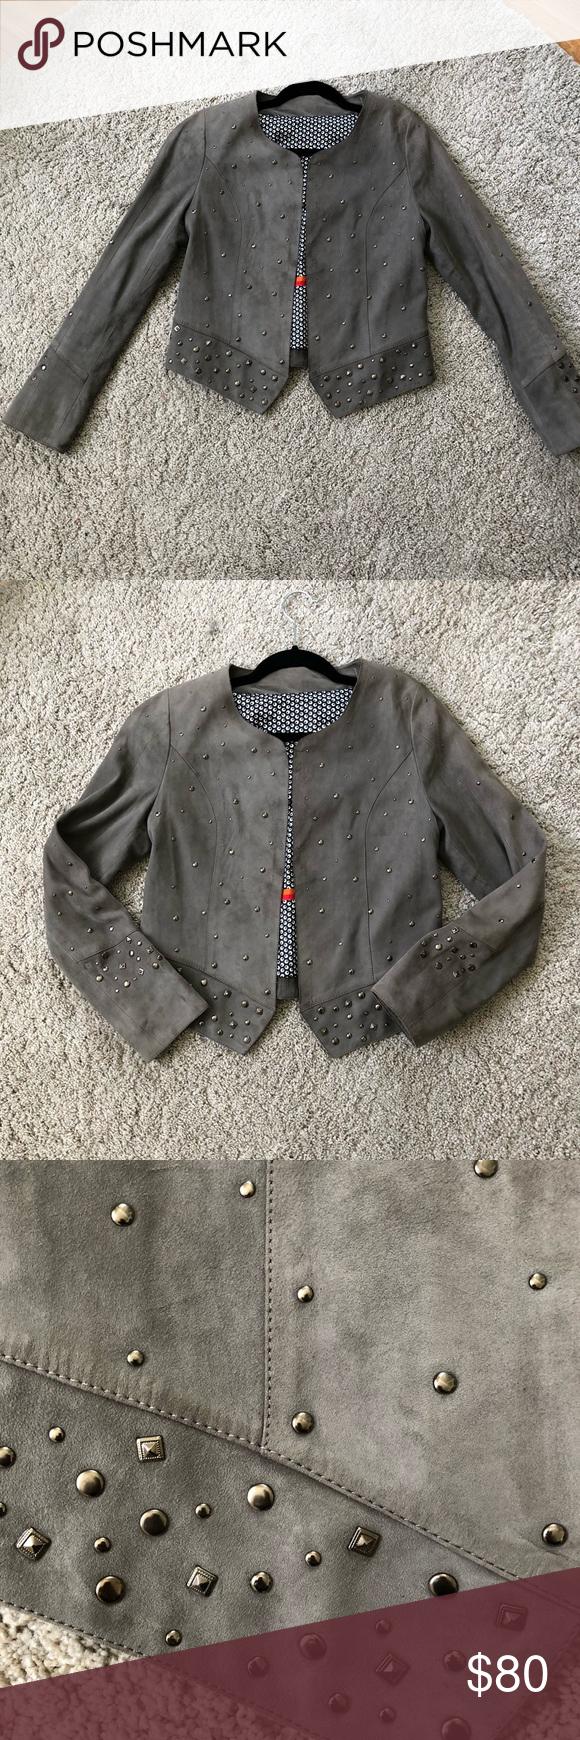 Clan Suede Leather Jacket Medium Grey Leather Jacket Suede Leather Leather Jacket